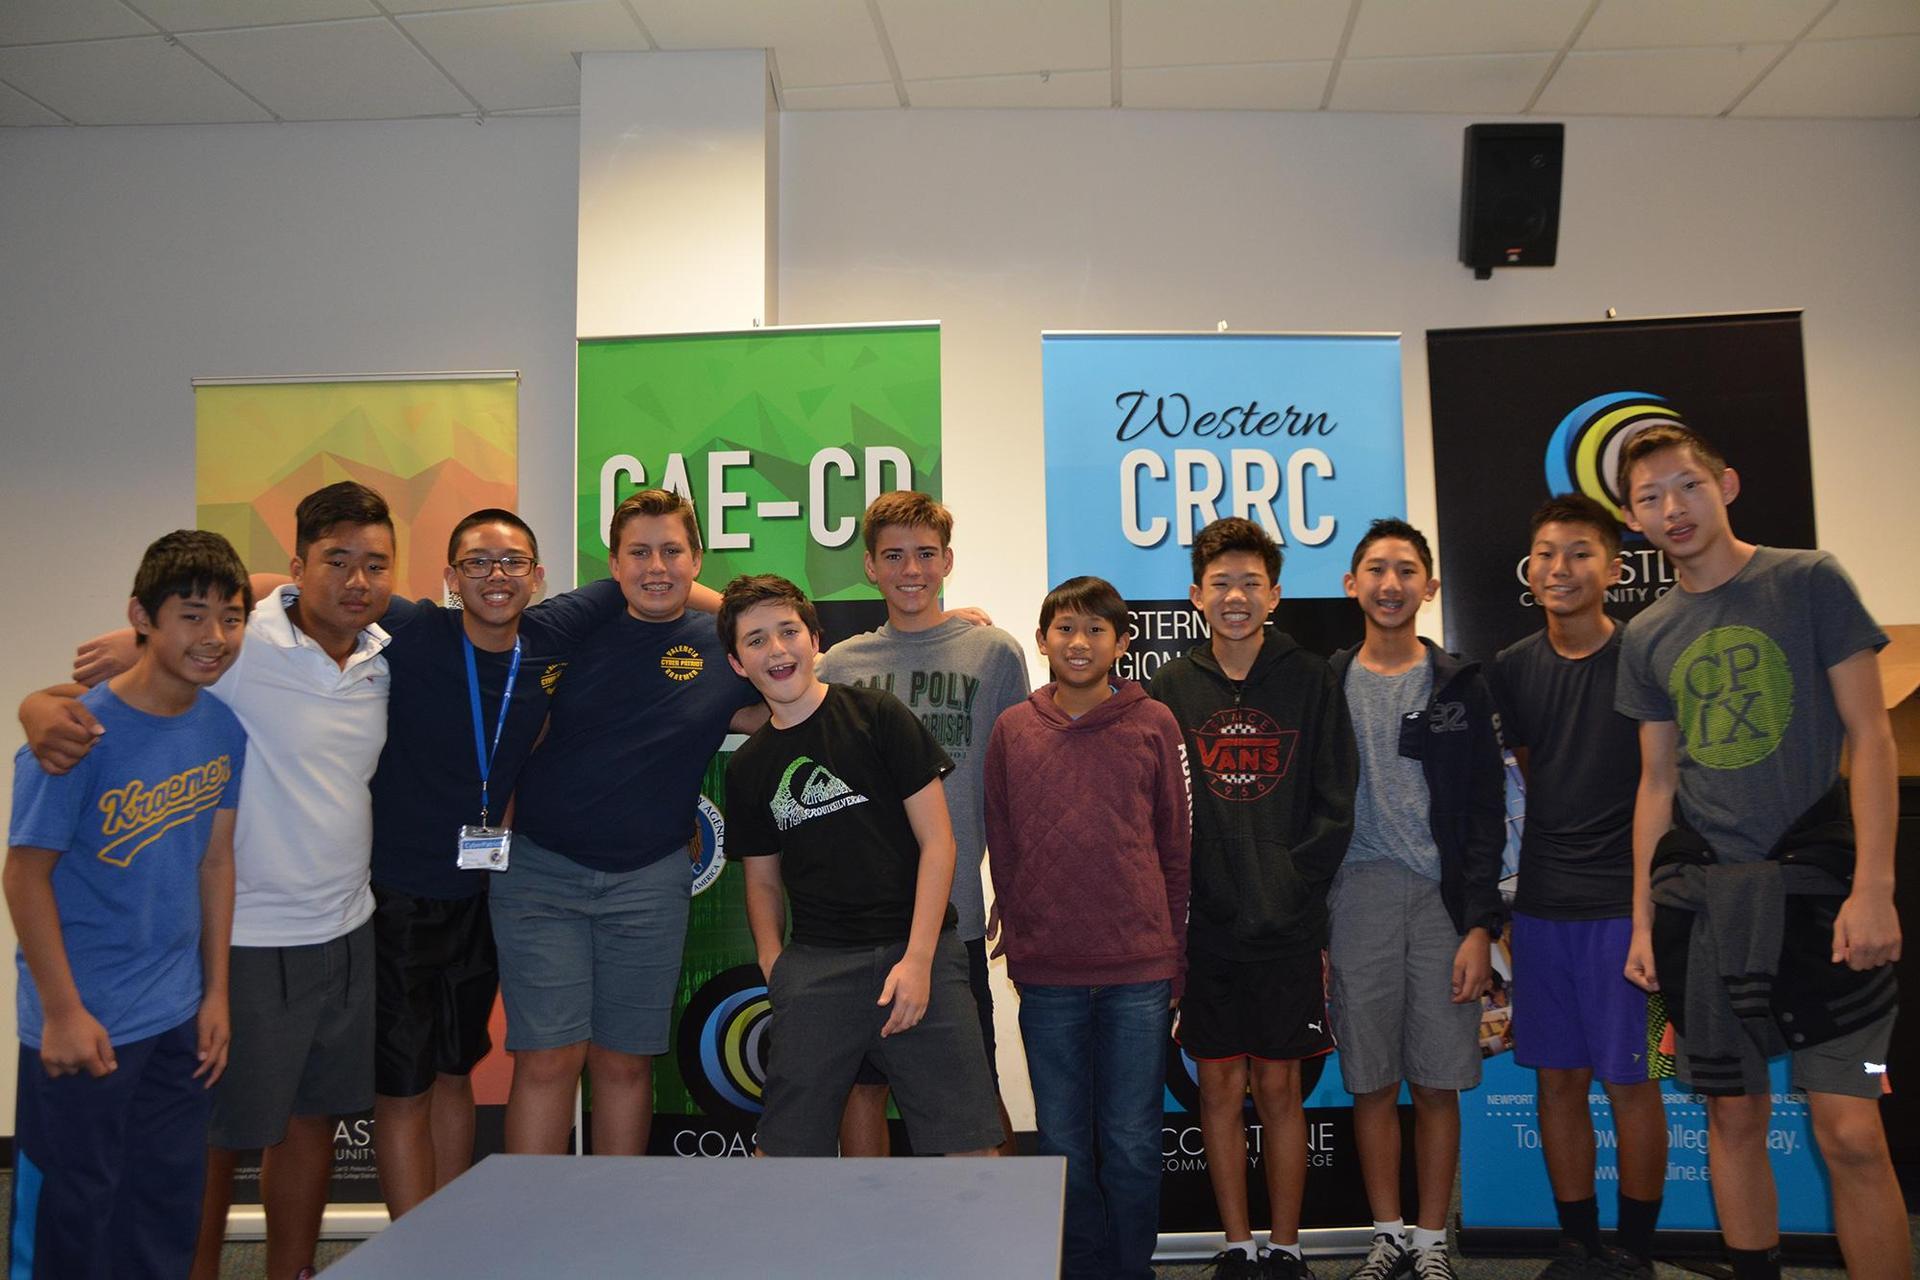 Cyber Patriots at Kraemer Middle School